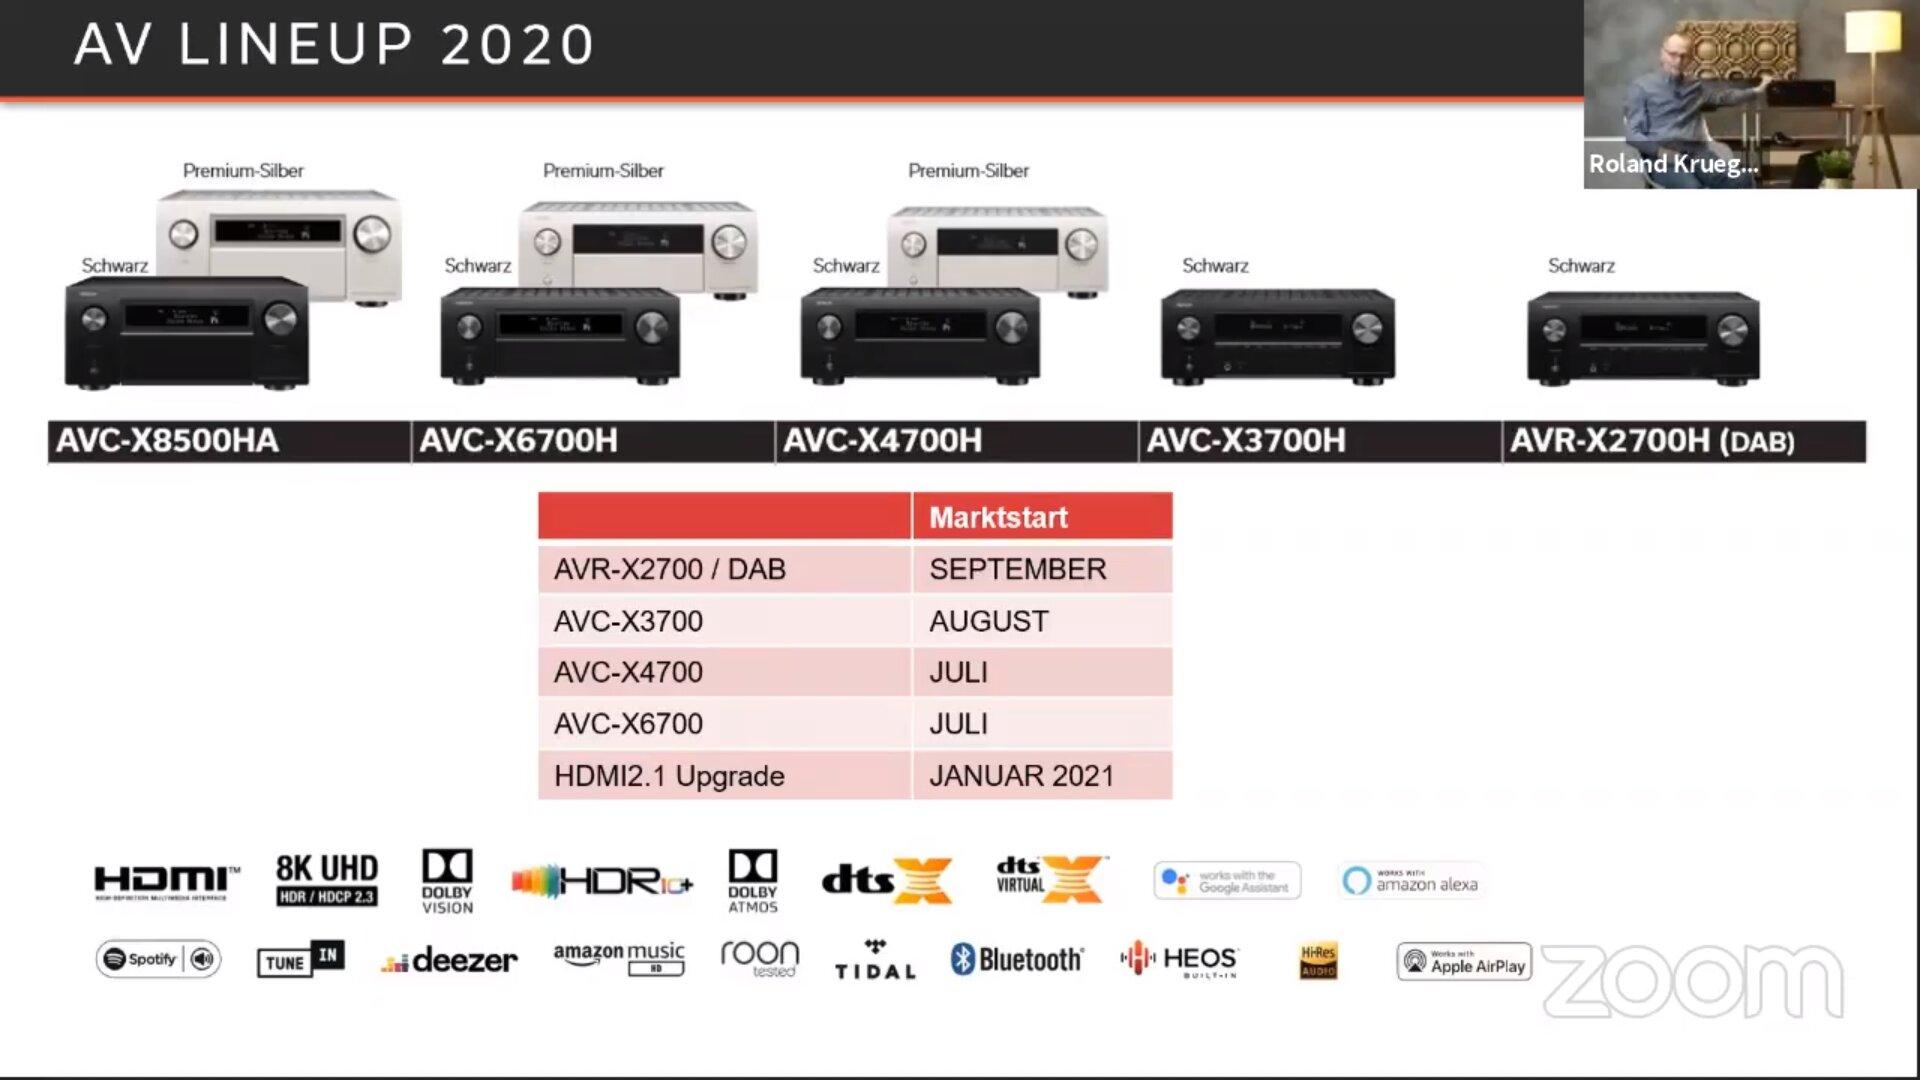 HDMI 2.1 für AVC-X8500H im Januar 2021